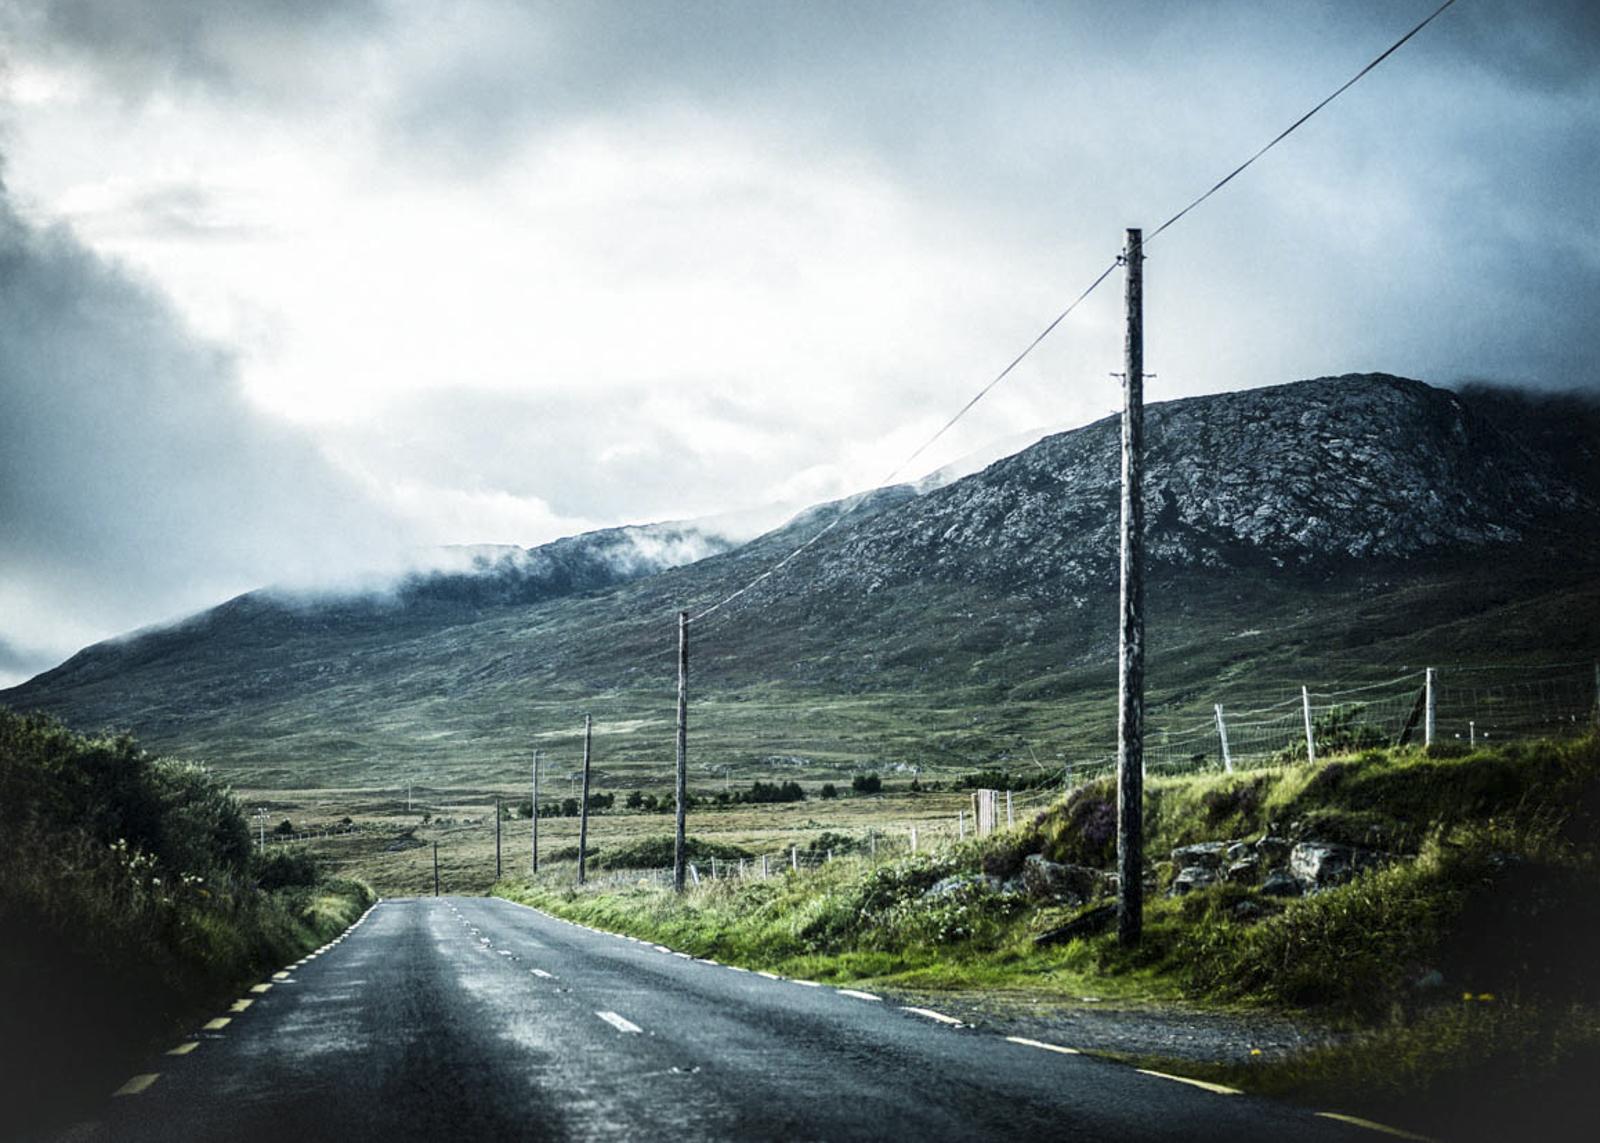 wka_IRELAND (42 of 137).jpg